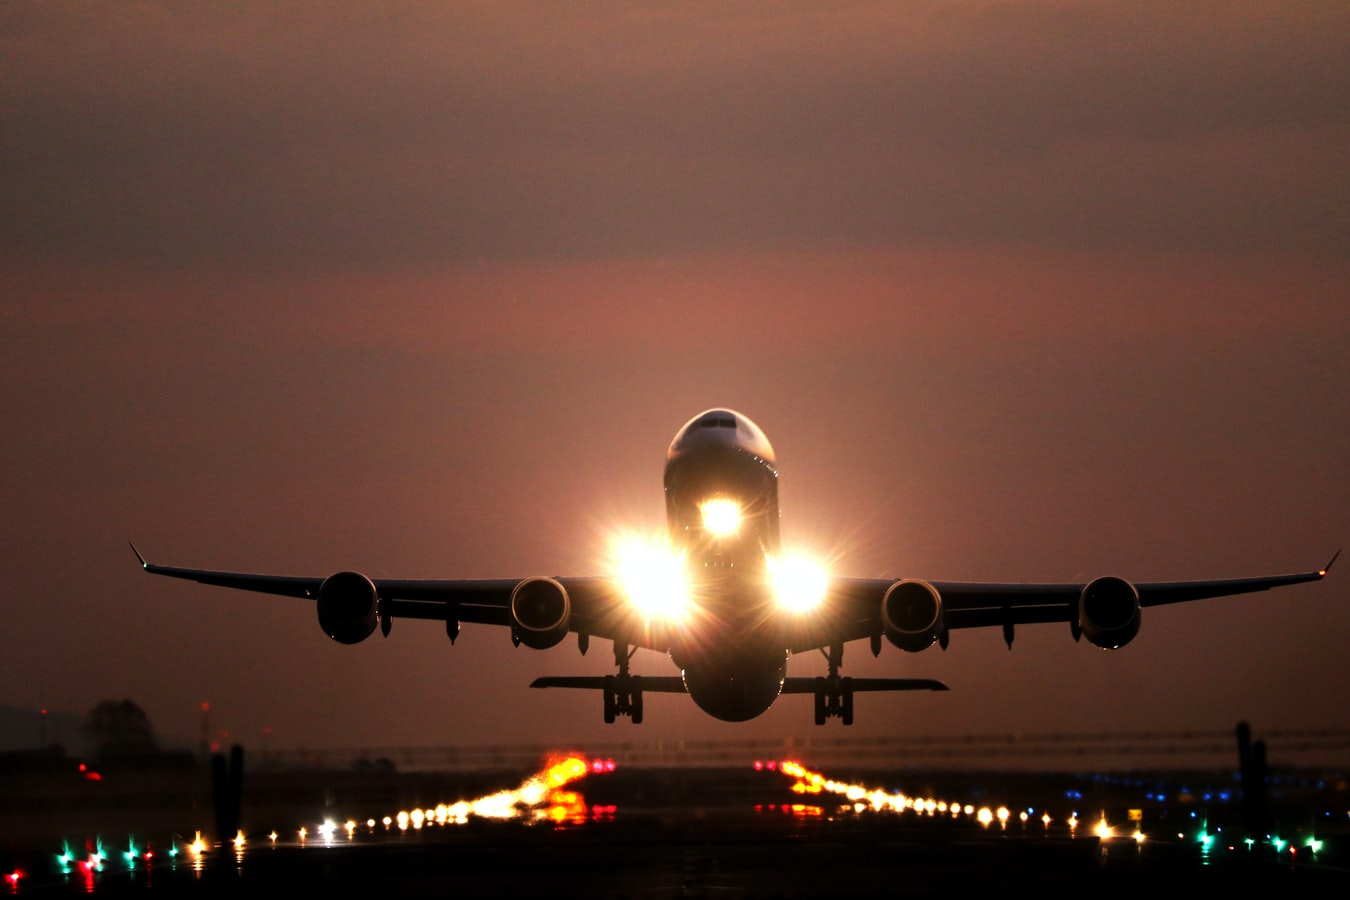 aerospace design and engineering consultants